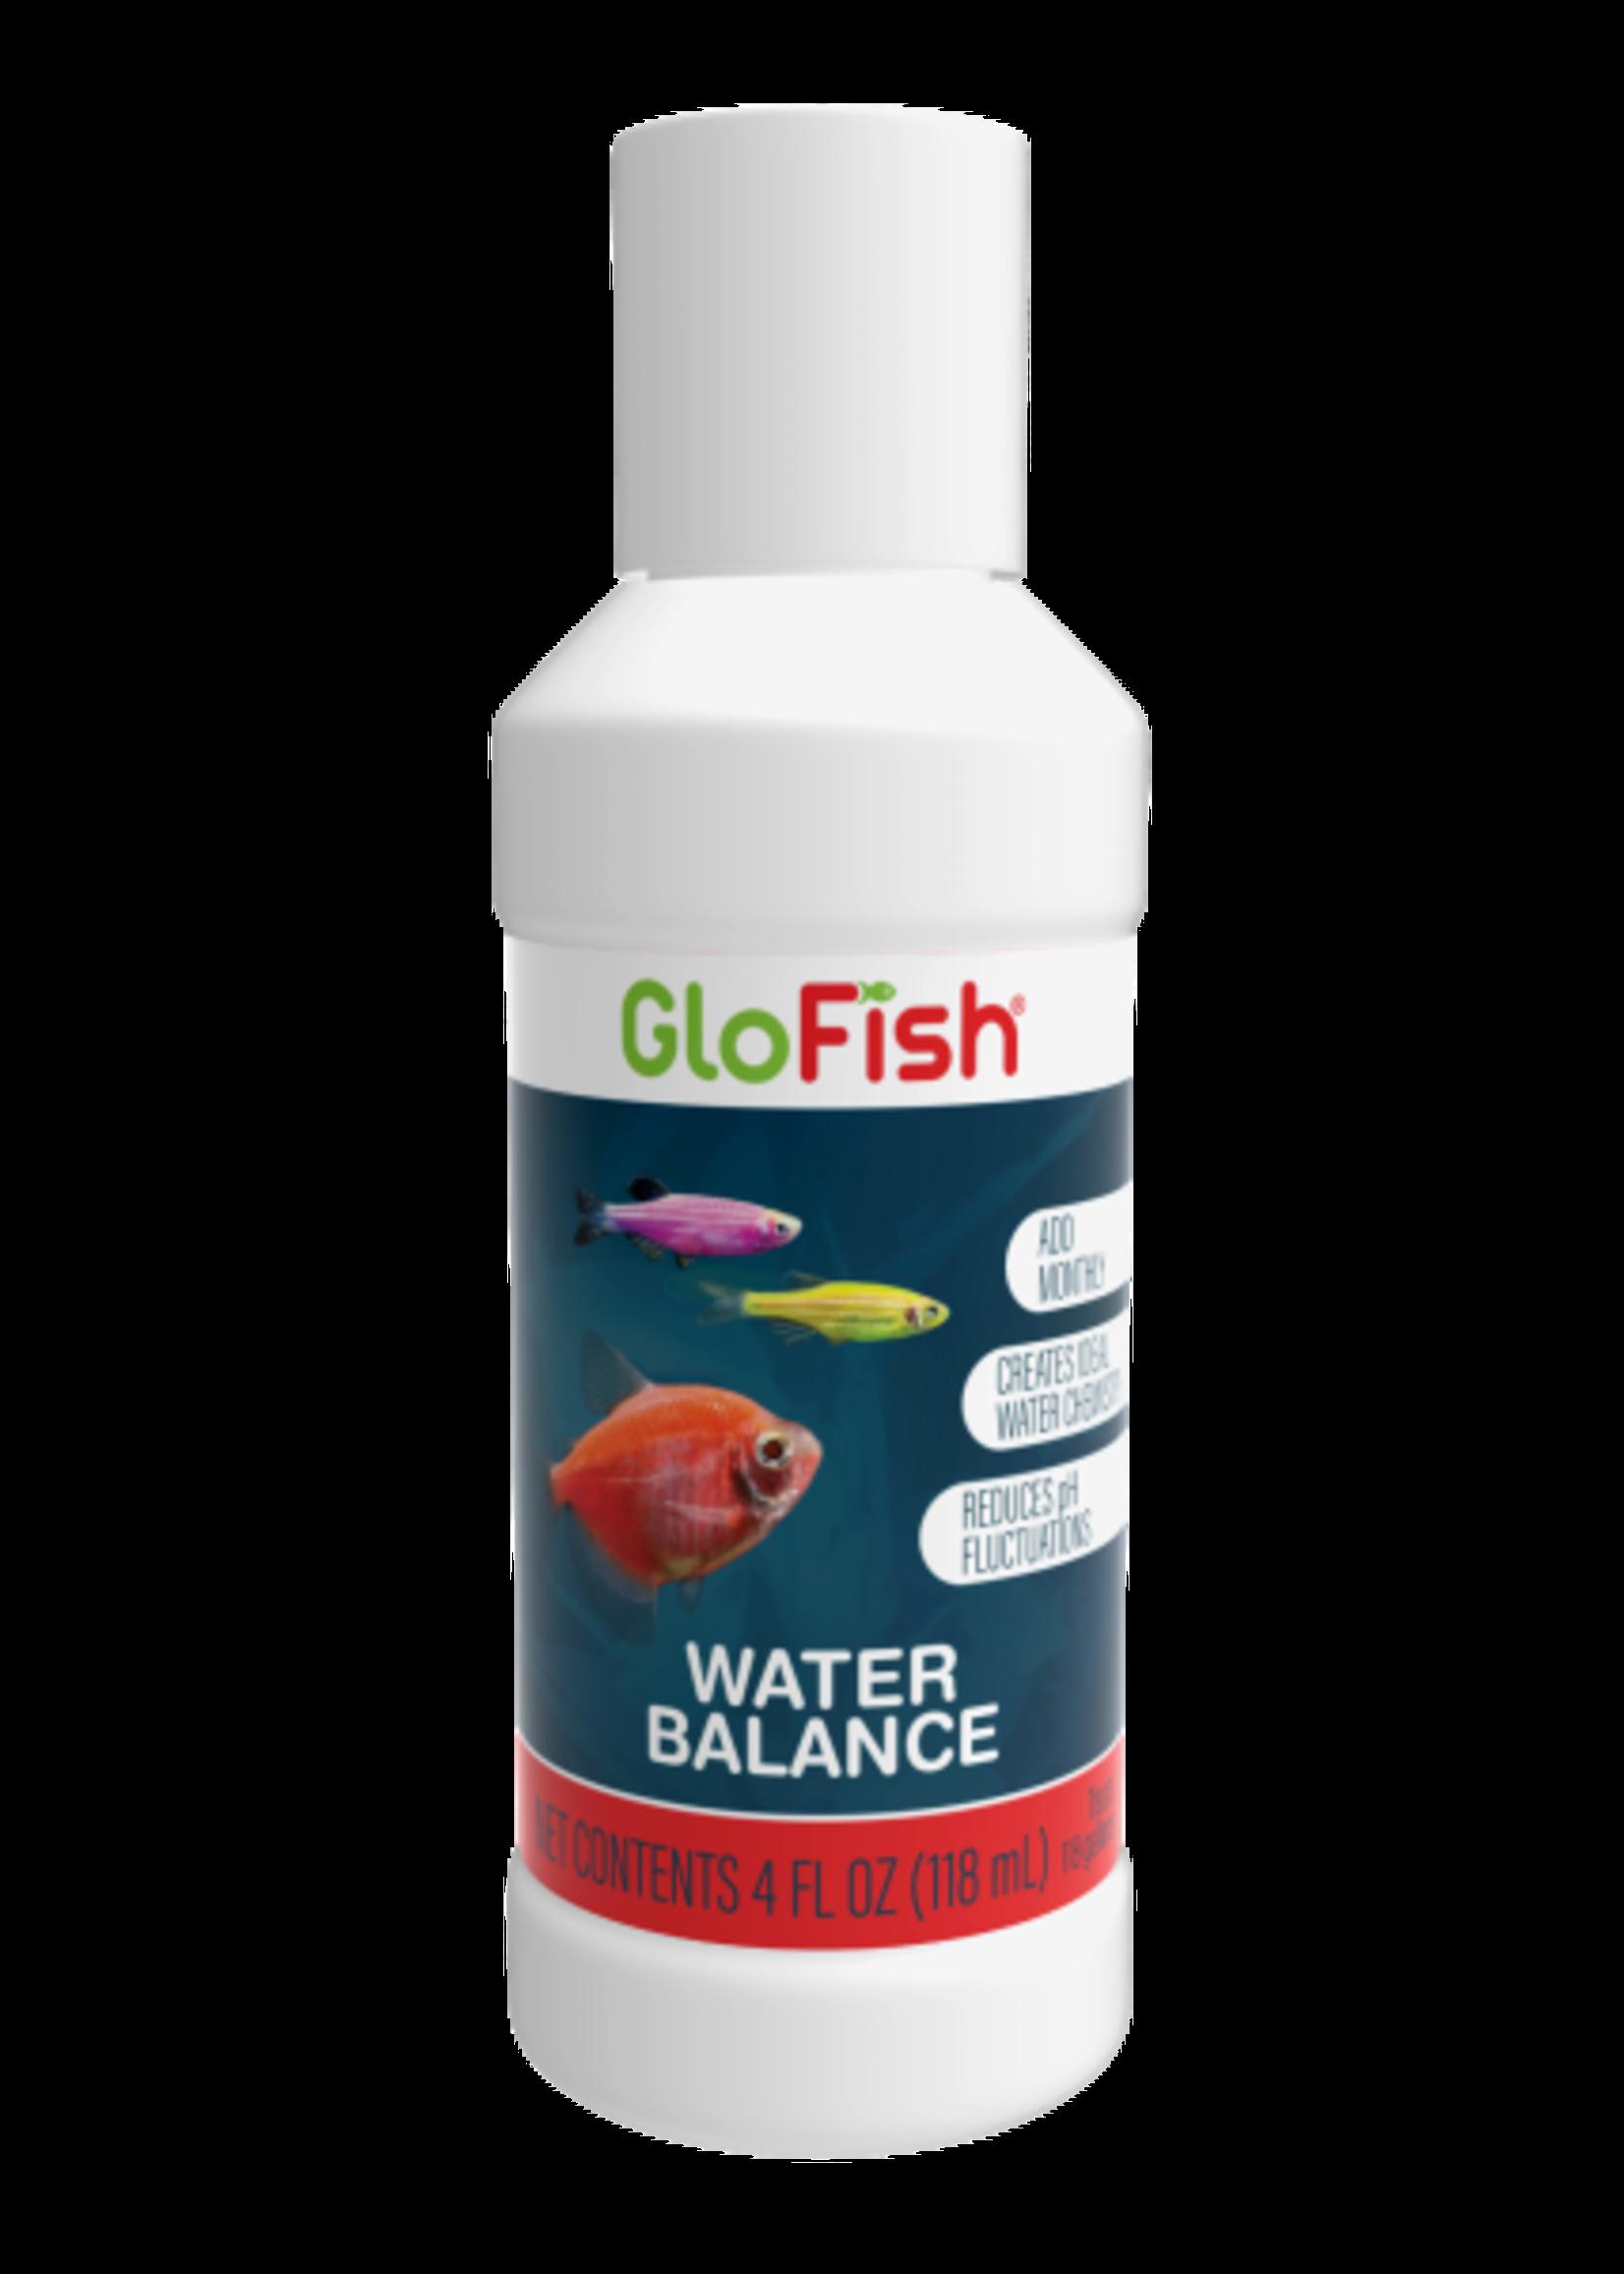 Tetra GloFish Water Balance 4oz